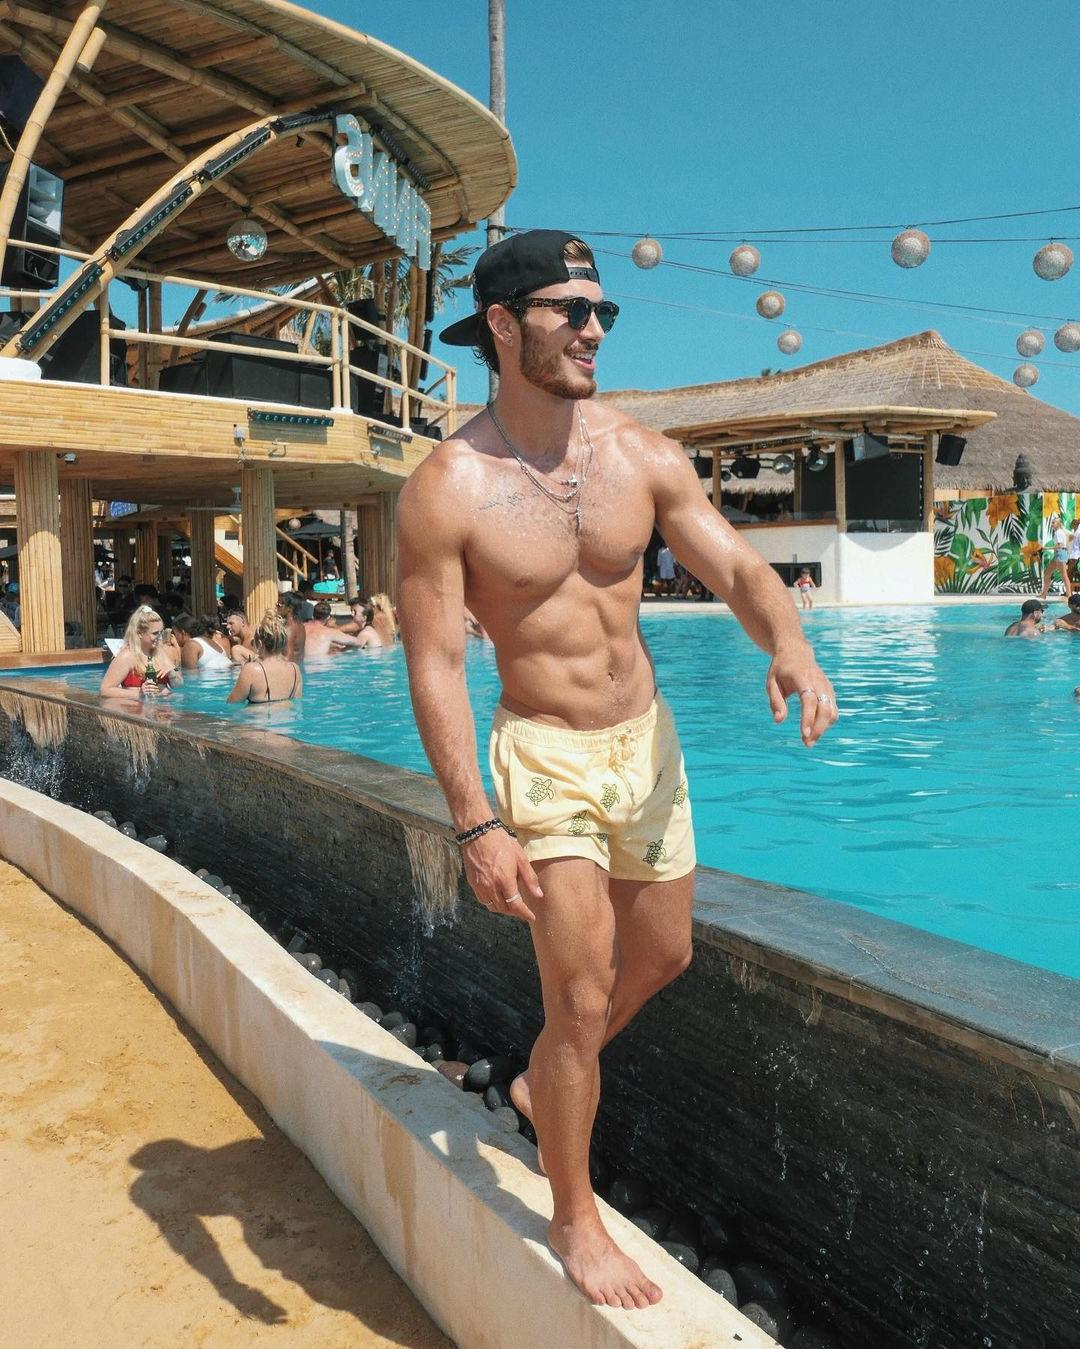 fit-pool-boys-michael-yerger-shirtless-sunglasses